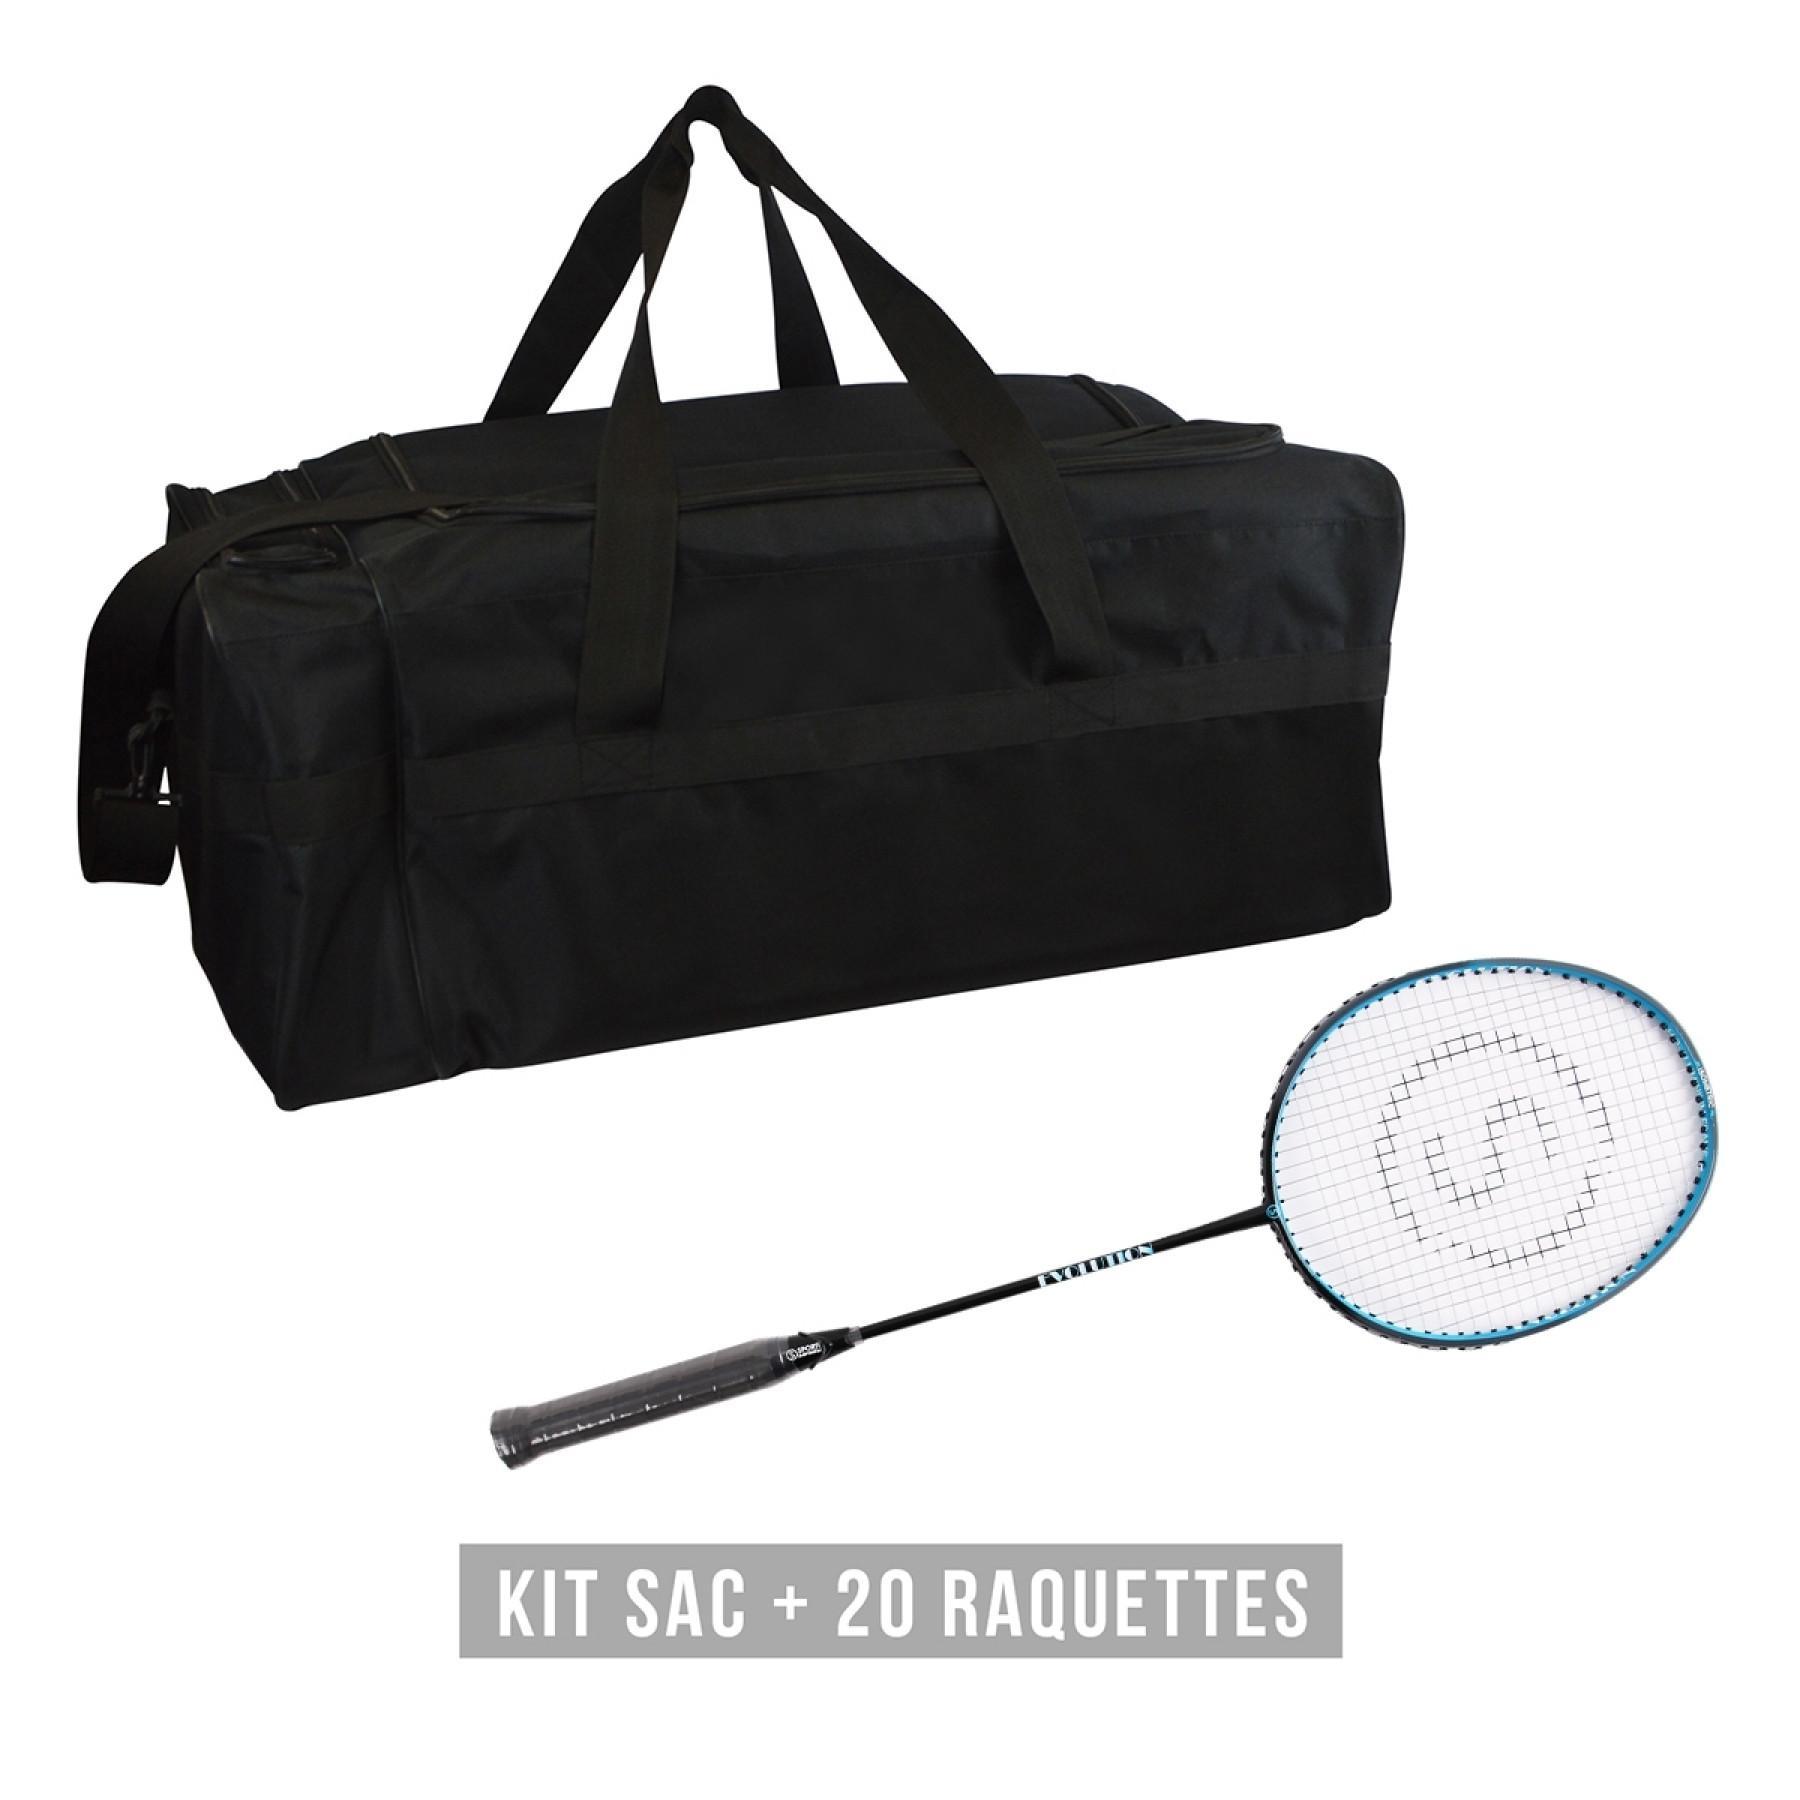 Racquet kit (bag + 20 racquets) Sporti France Evolution